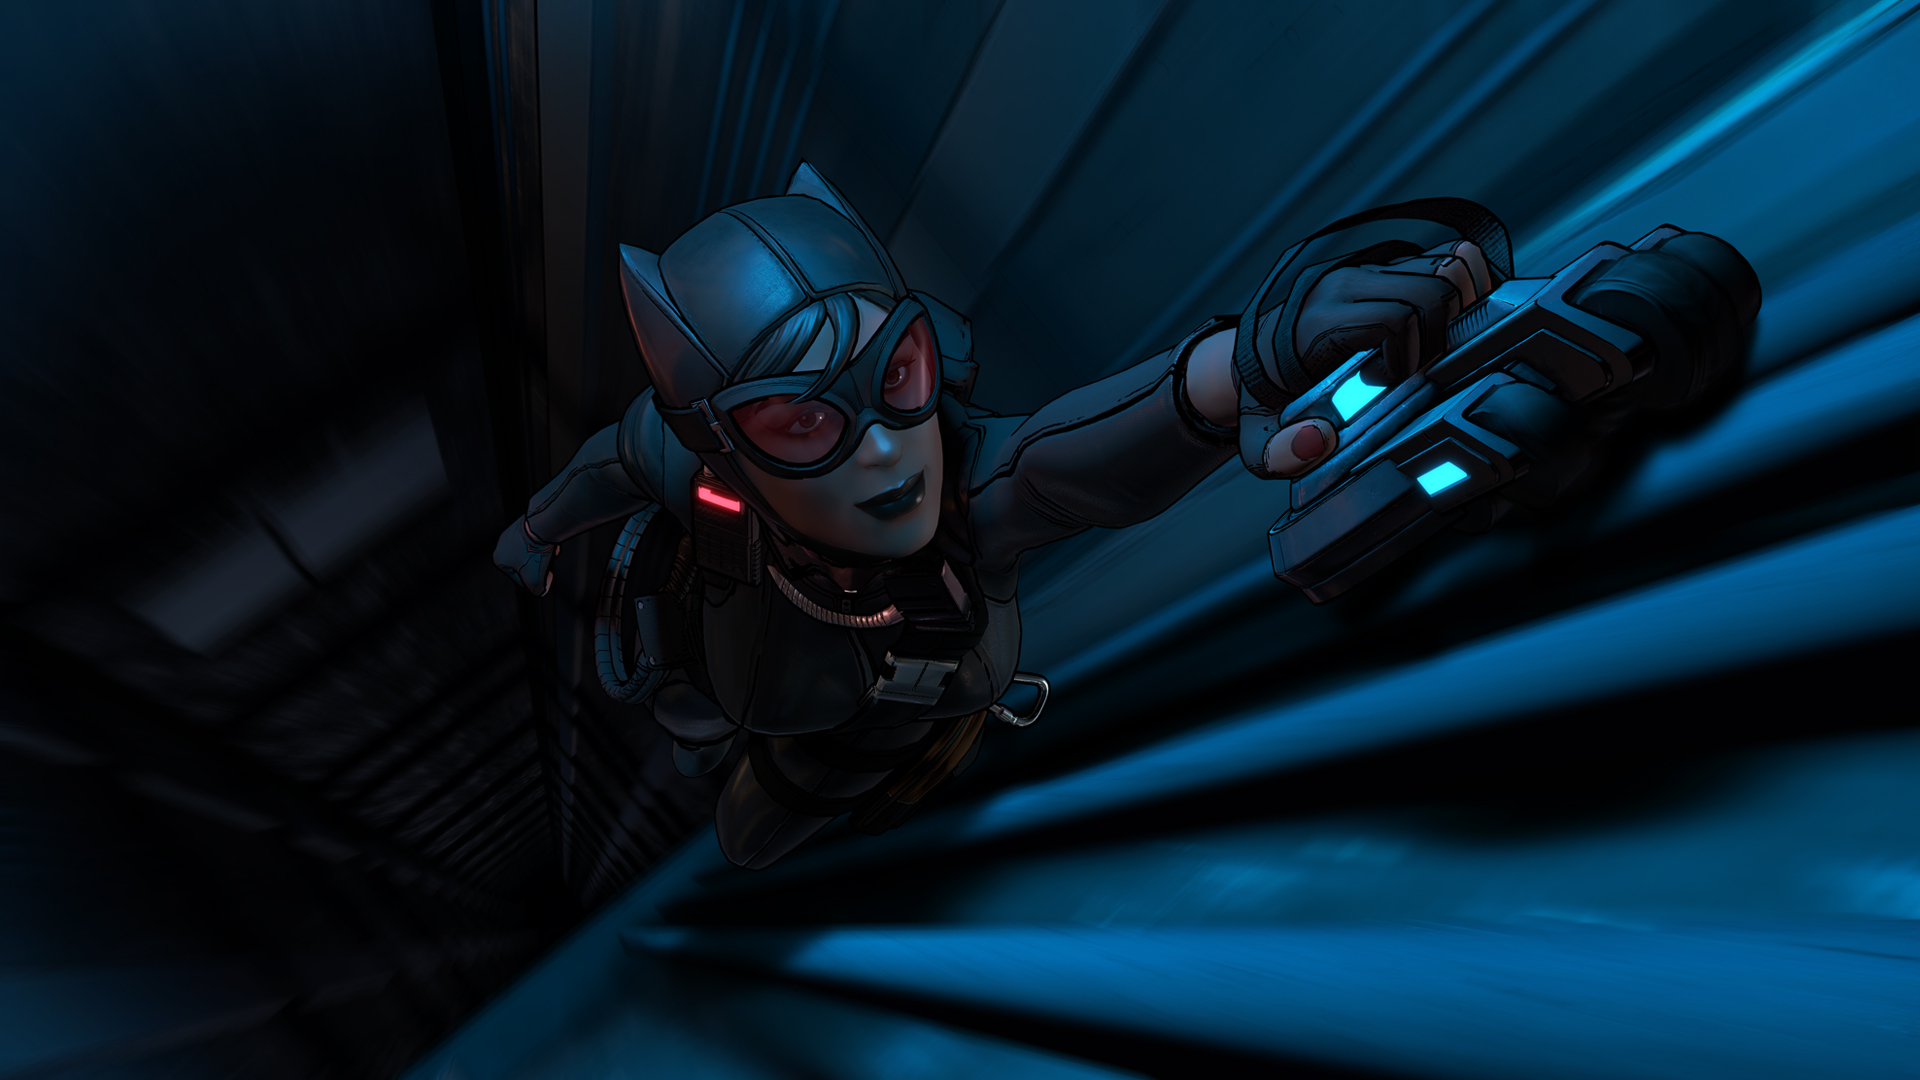 Image of Batman The Telltale Series Episode 1 Repack PC Game Full Version Free Download